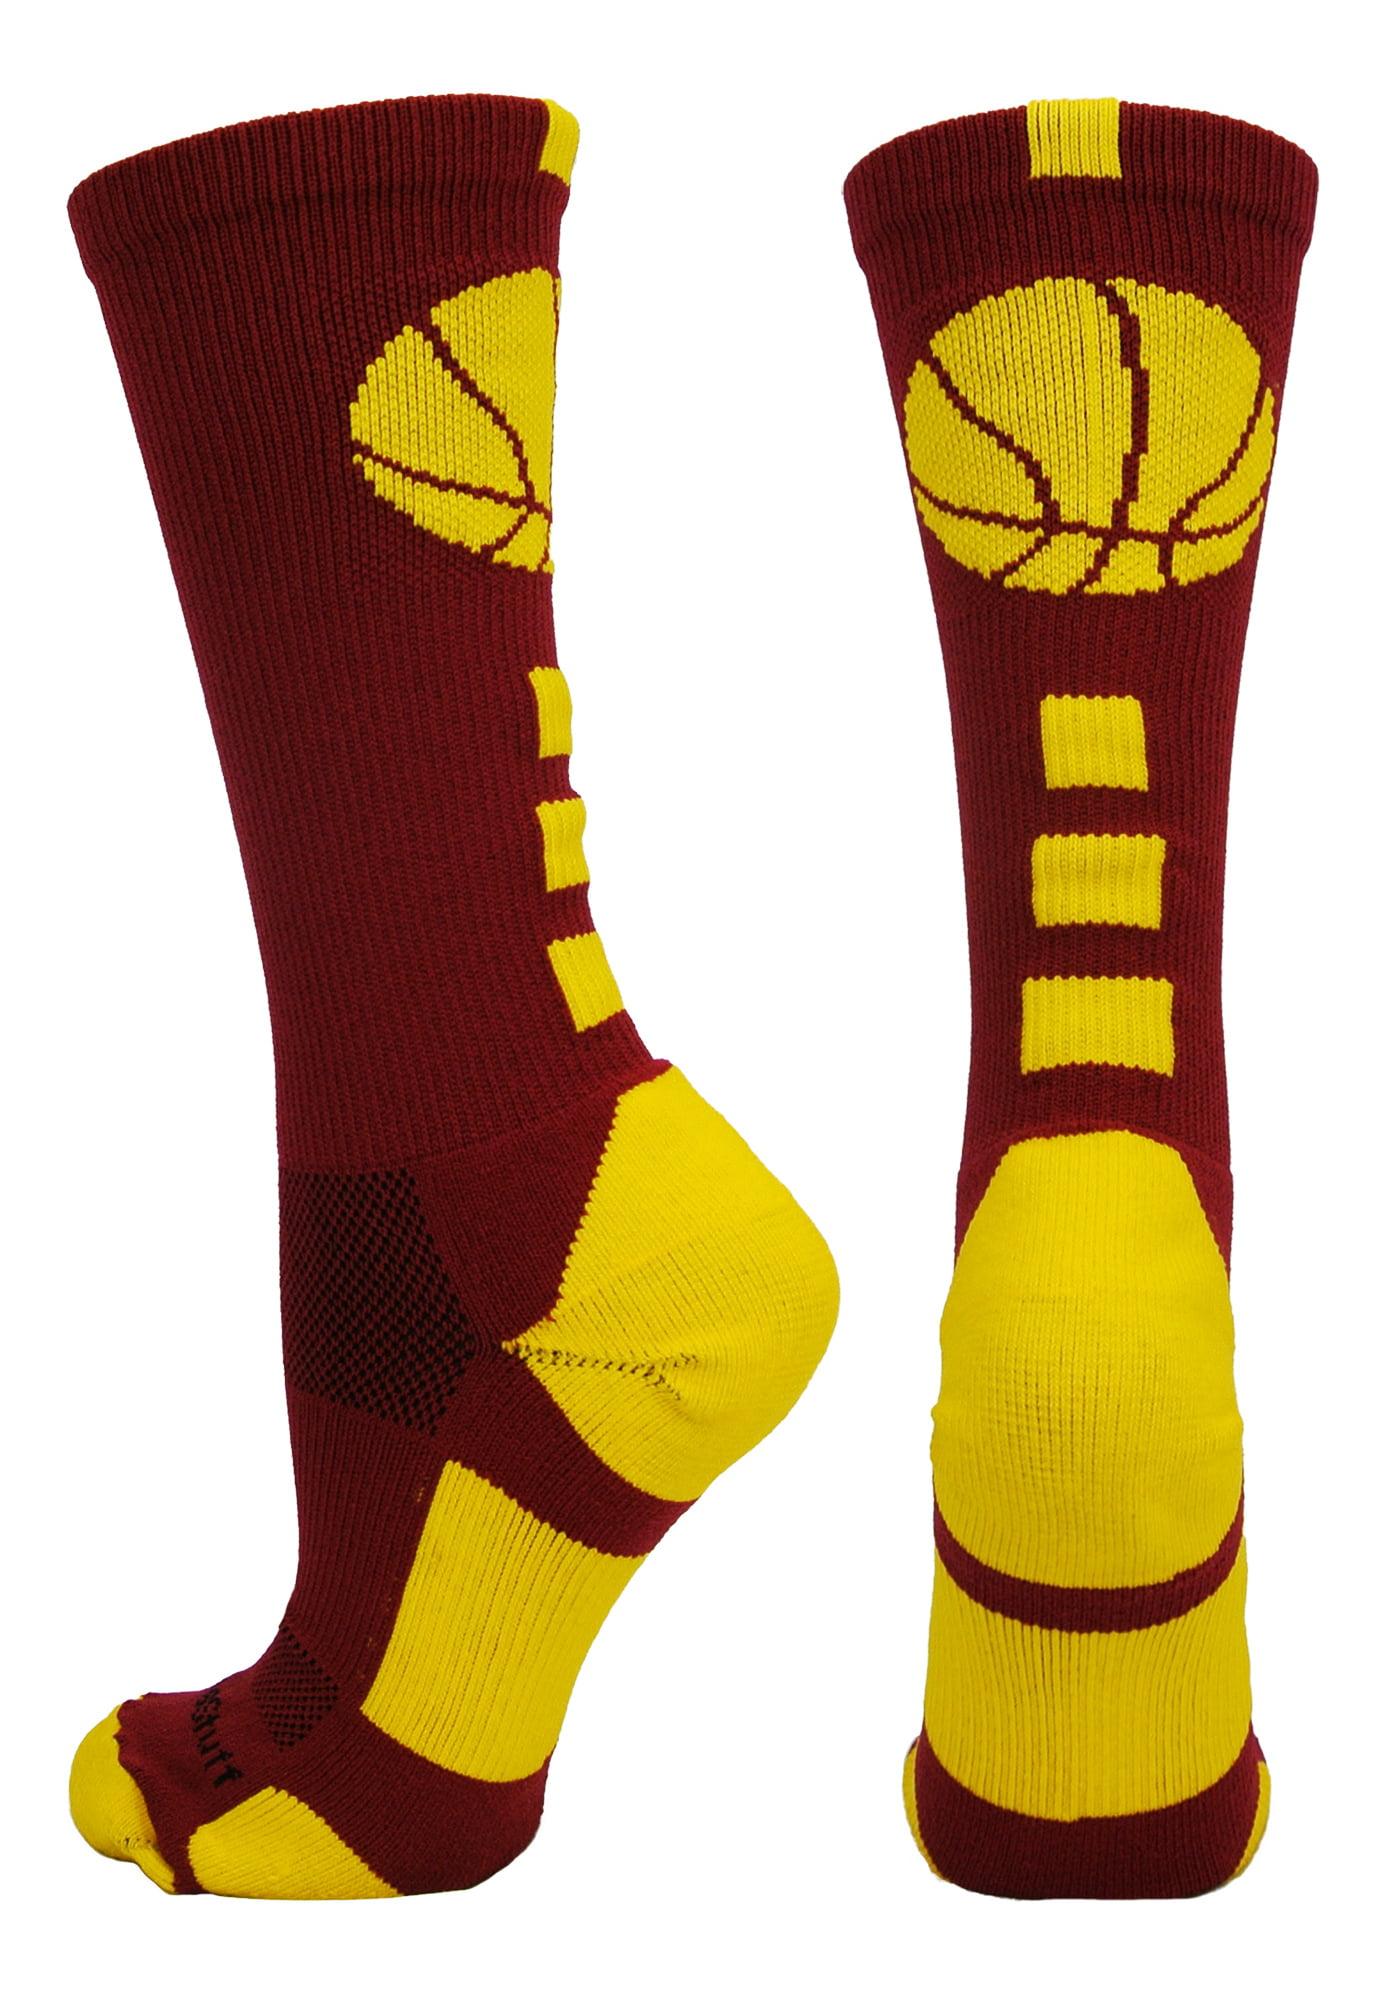 Basketball Logo Crew Socks (Royal/Gold, Large) - Royal/Gold,Large